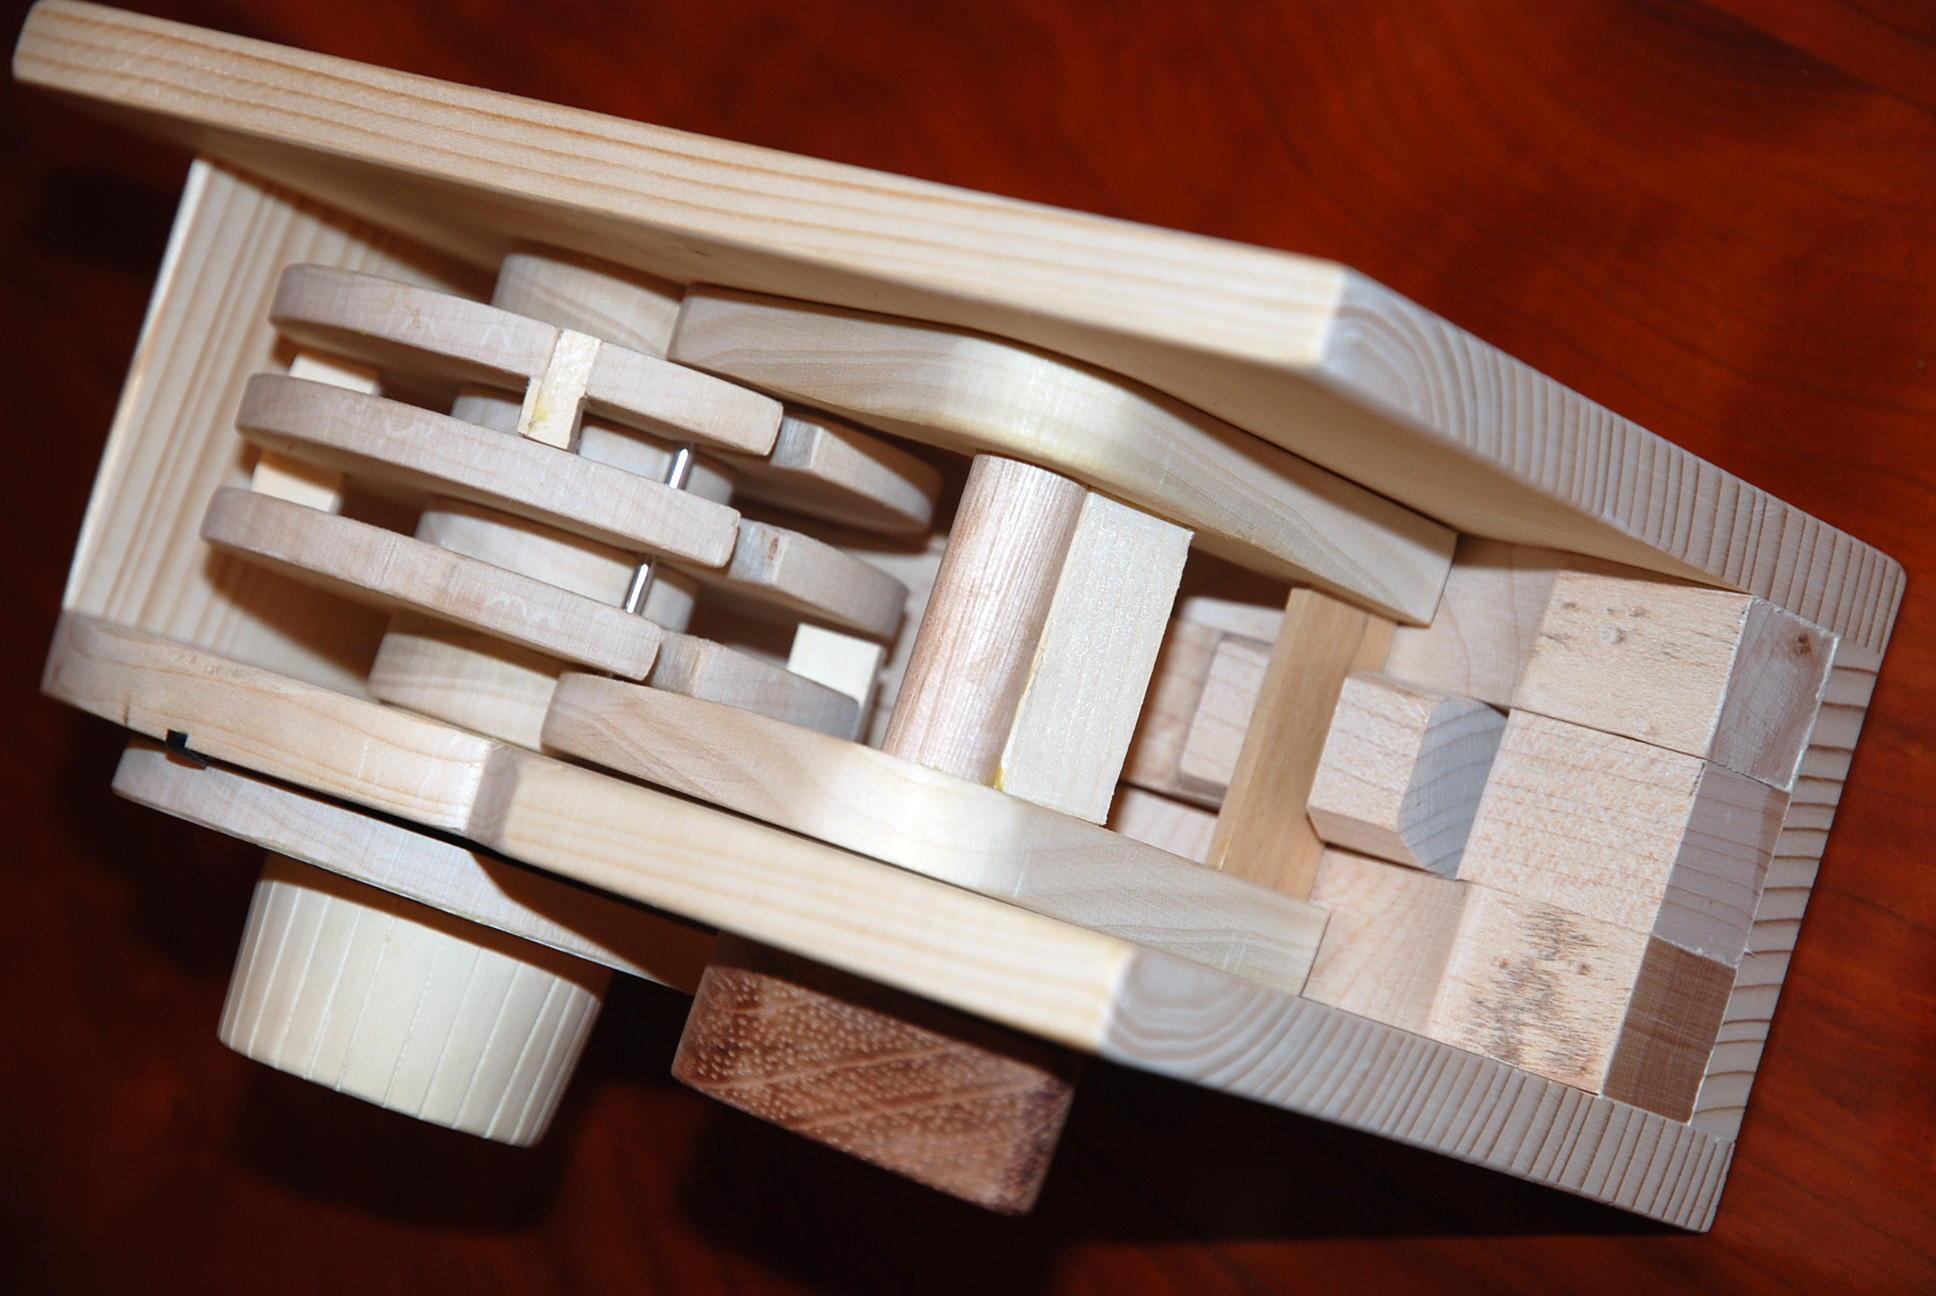 Wooden Combination Lock Plans Diy Free Download Build